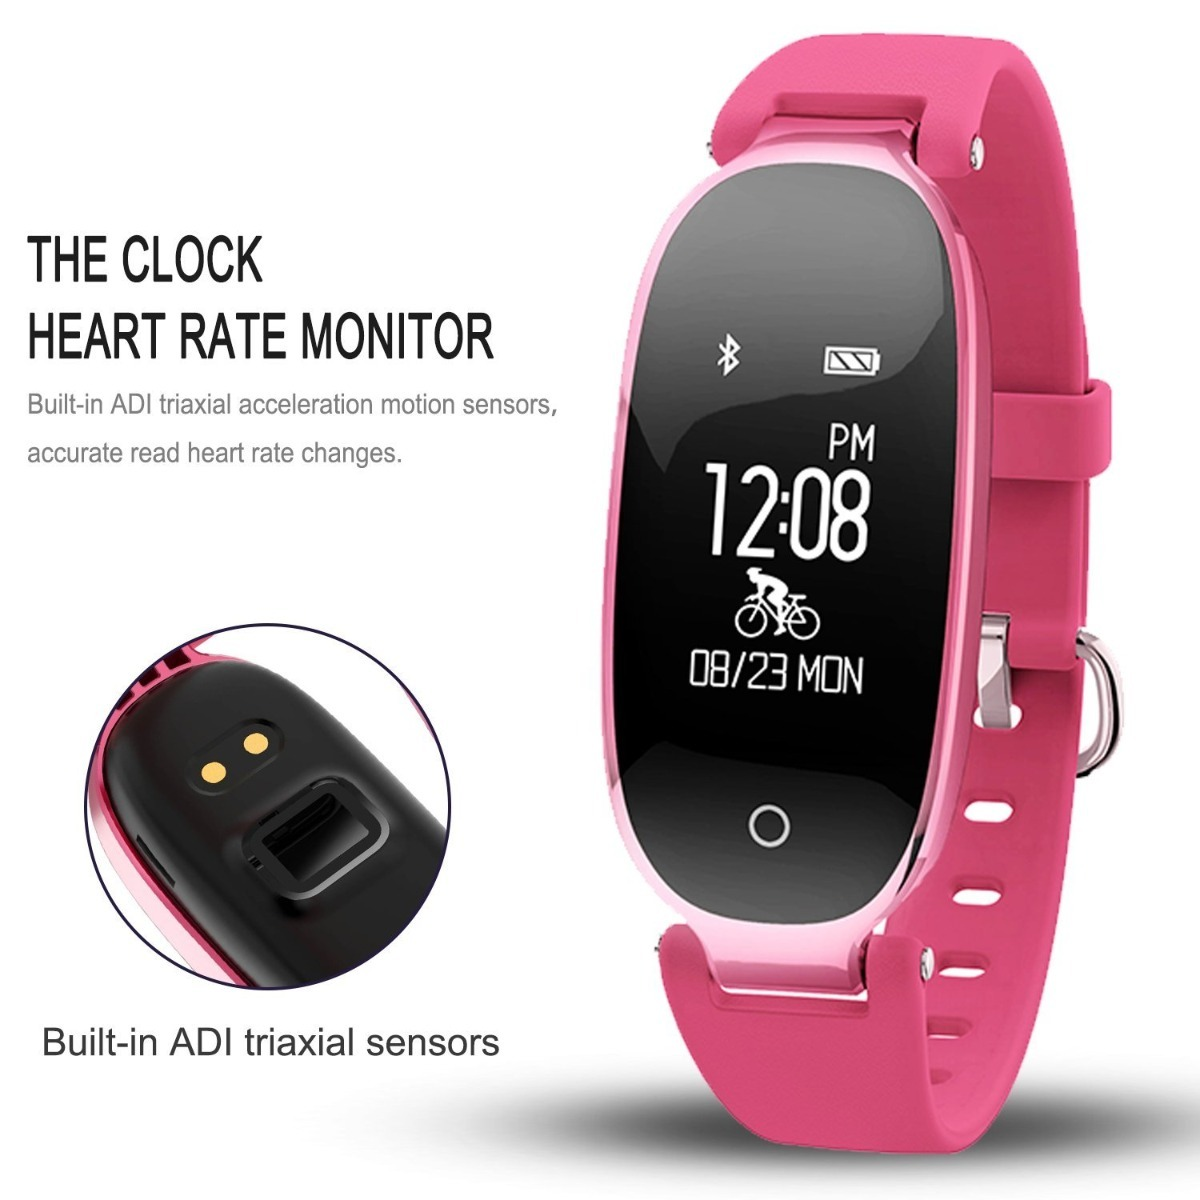 e2d14de2a2a5 Reloj Fitness Tracker Pulsera Inteligente Monitor R.c -   279.900 en ...